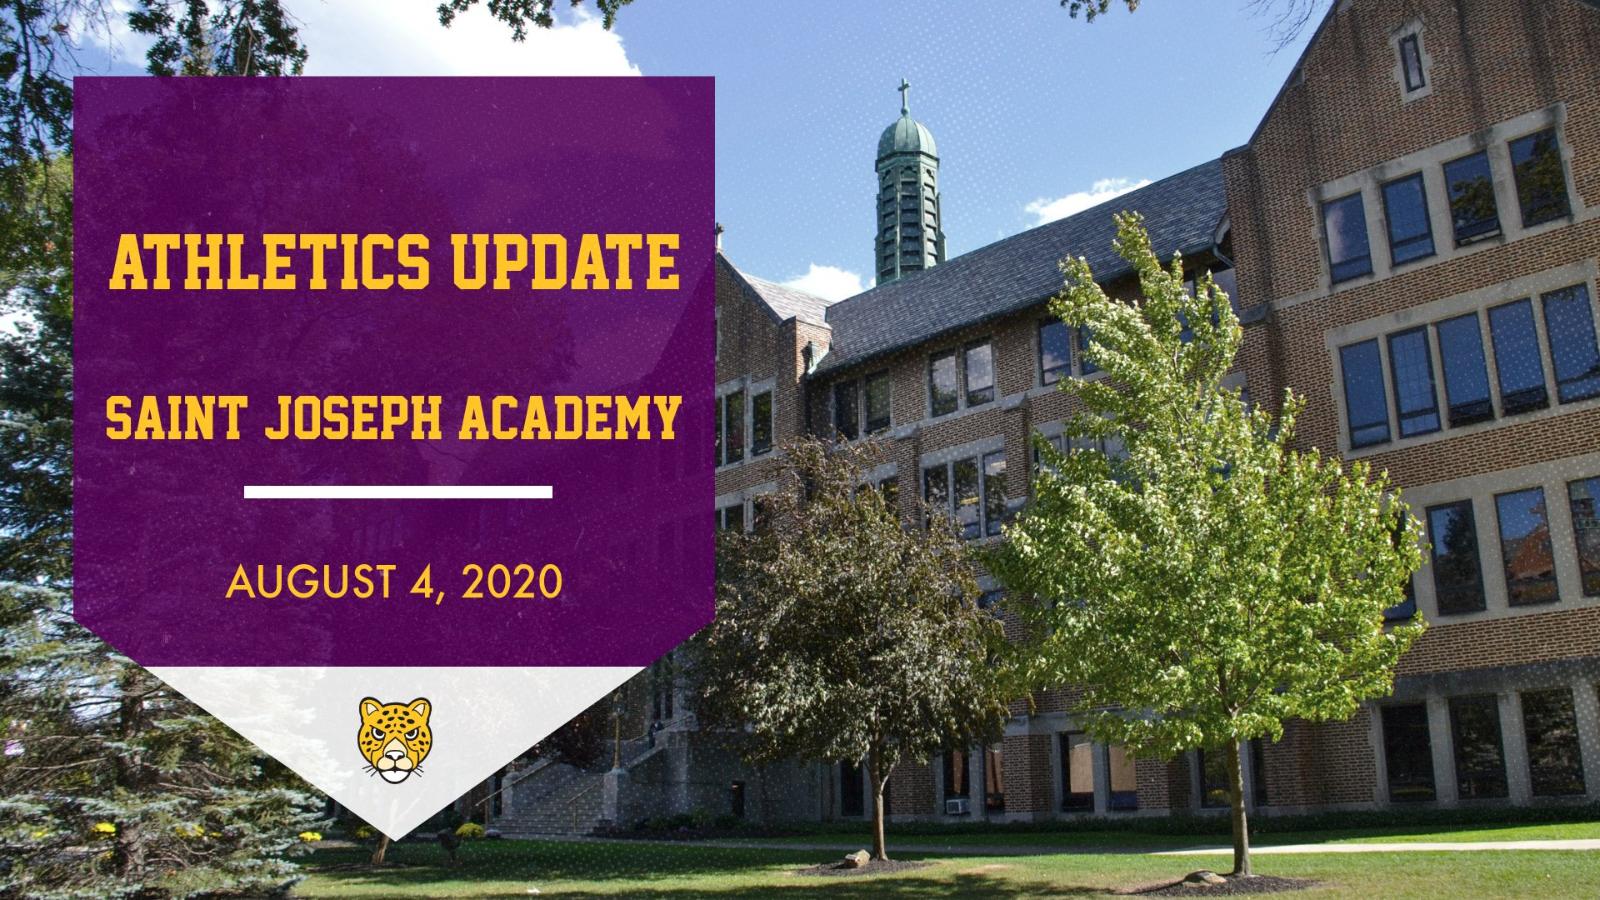 Saint Joseph Academy Athletics Update – August 4